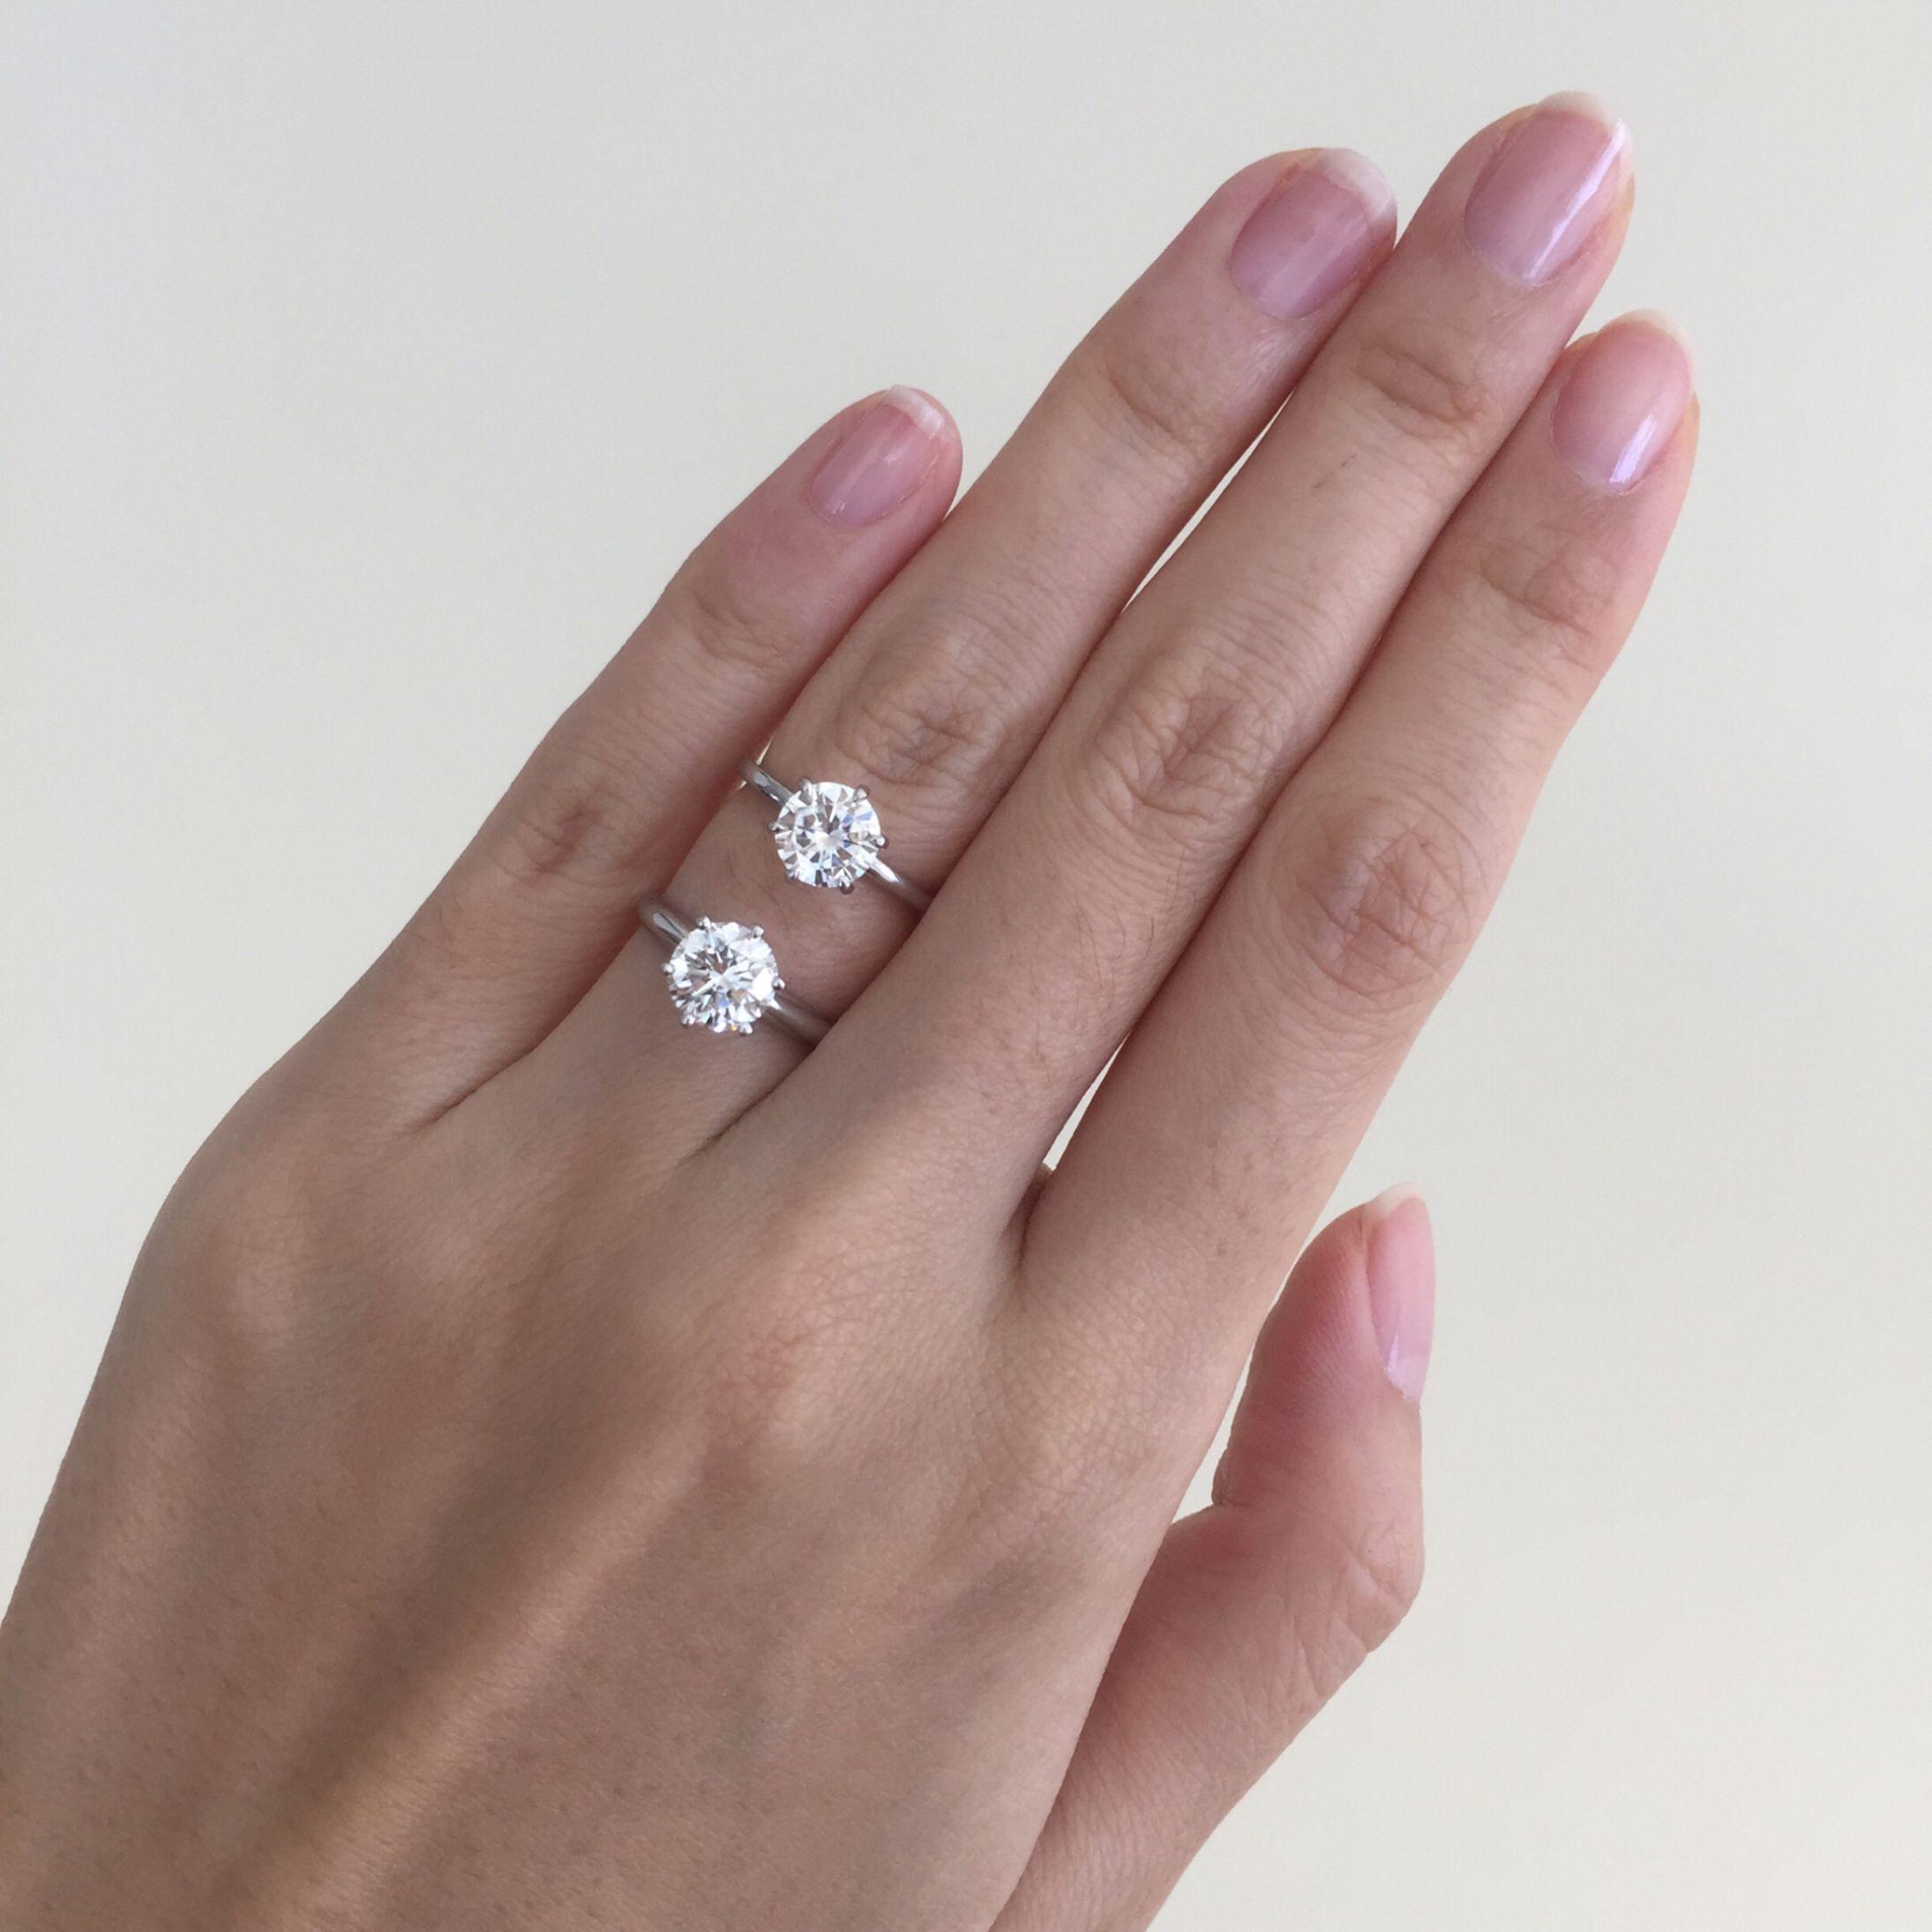 Moissanite vs Diamond 4 Key Differences Engagement